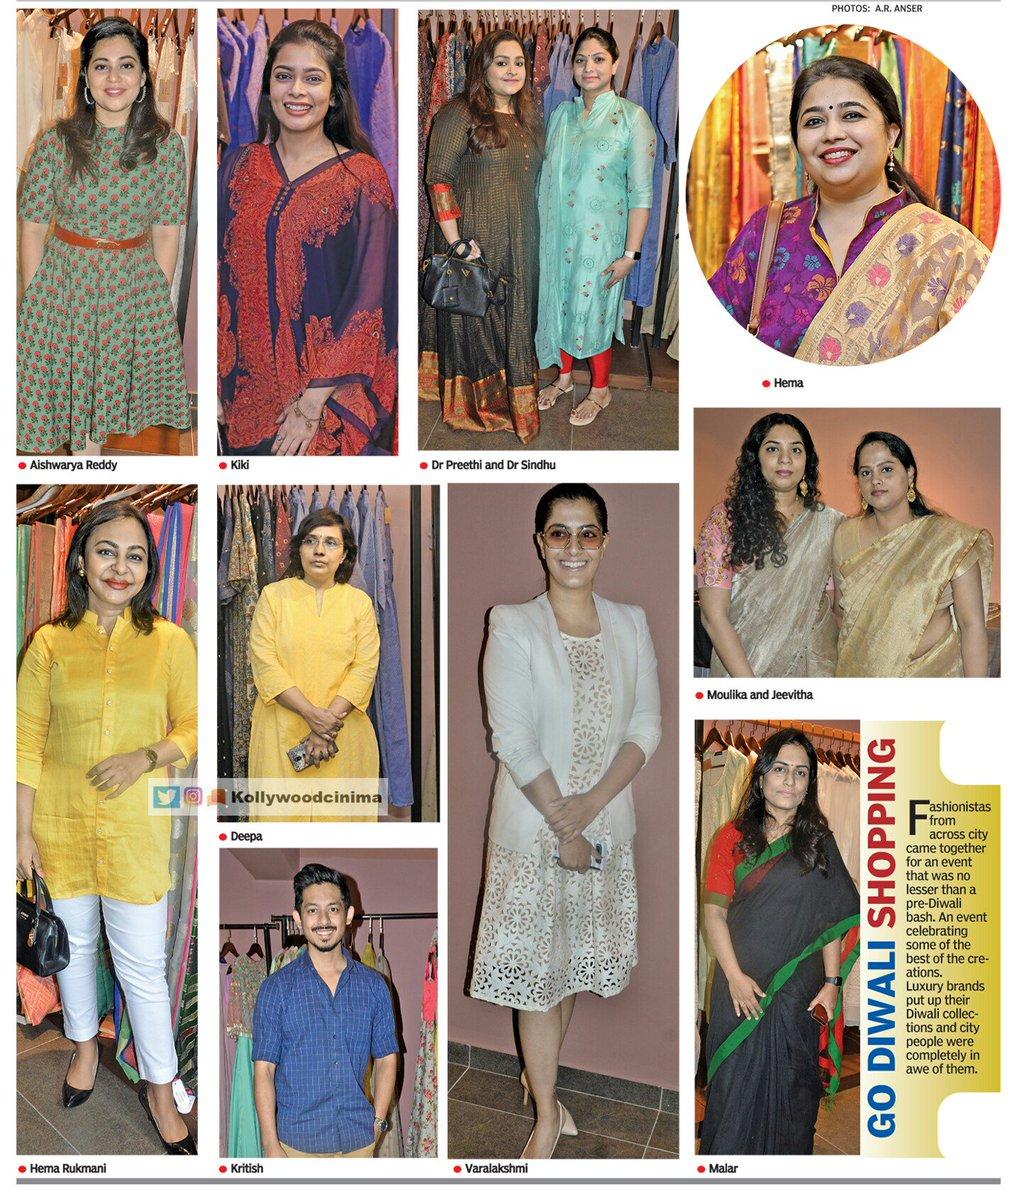 Diwali Shopping - @KikiVijay @Hemarukmani1 @varusarath @VffVishal - @DeccanChronicle   #KollywoodCinima